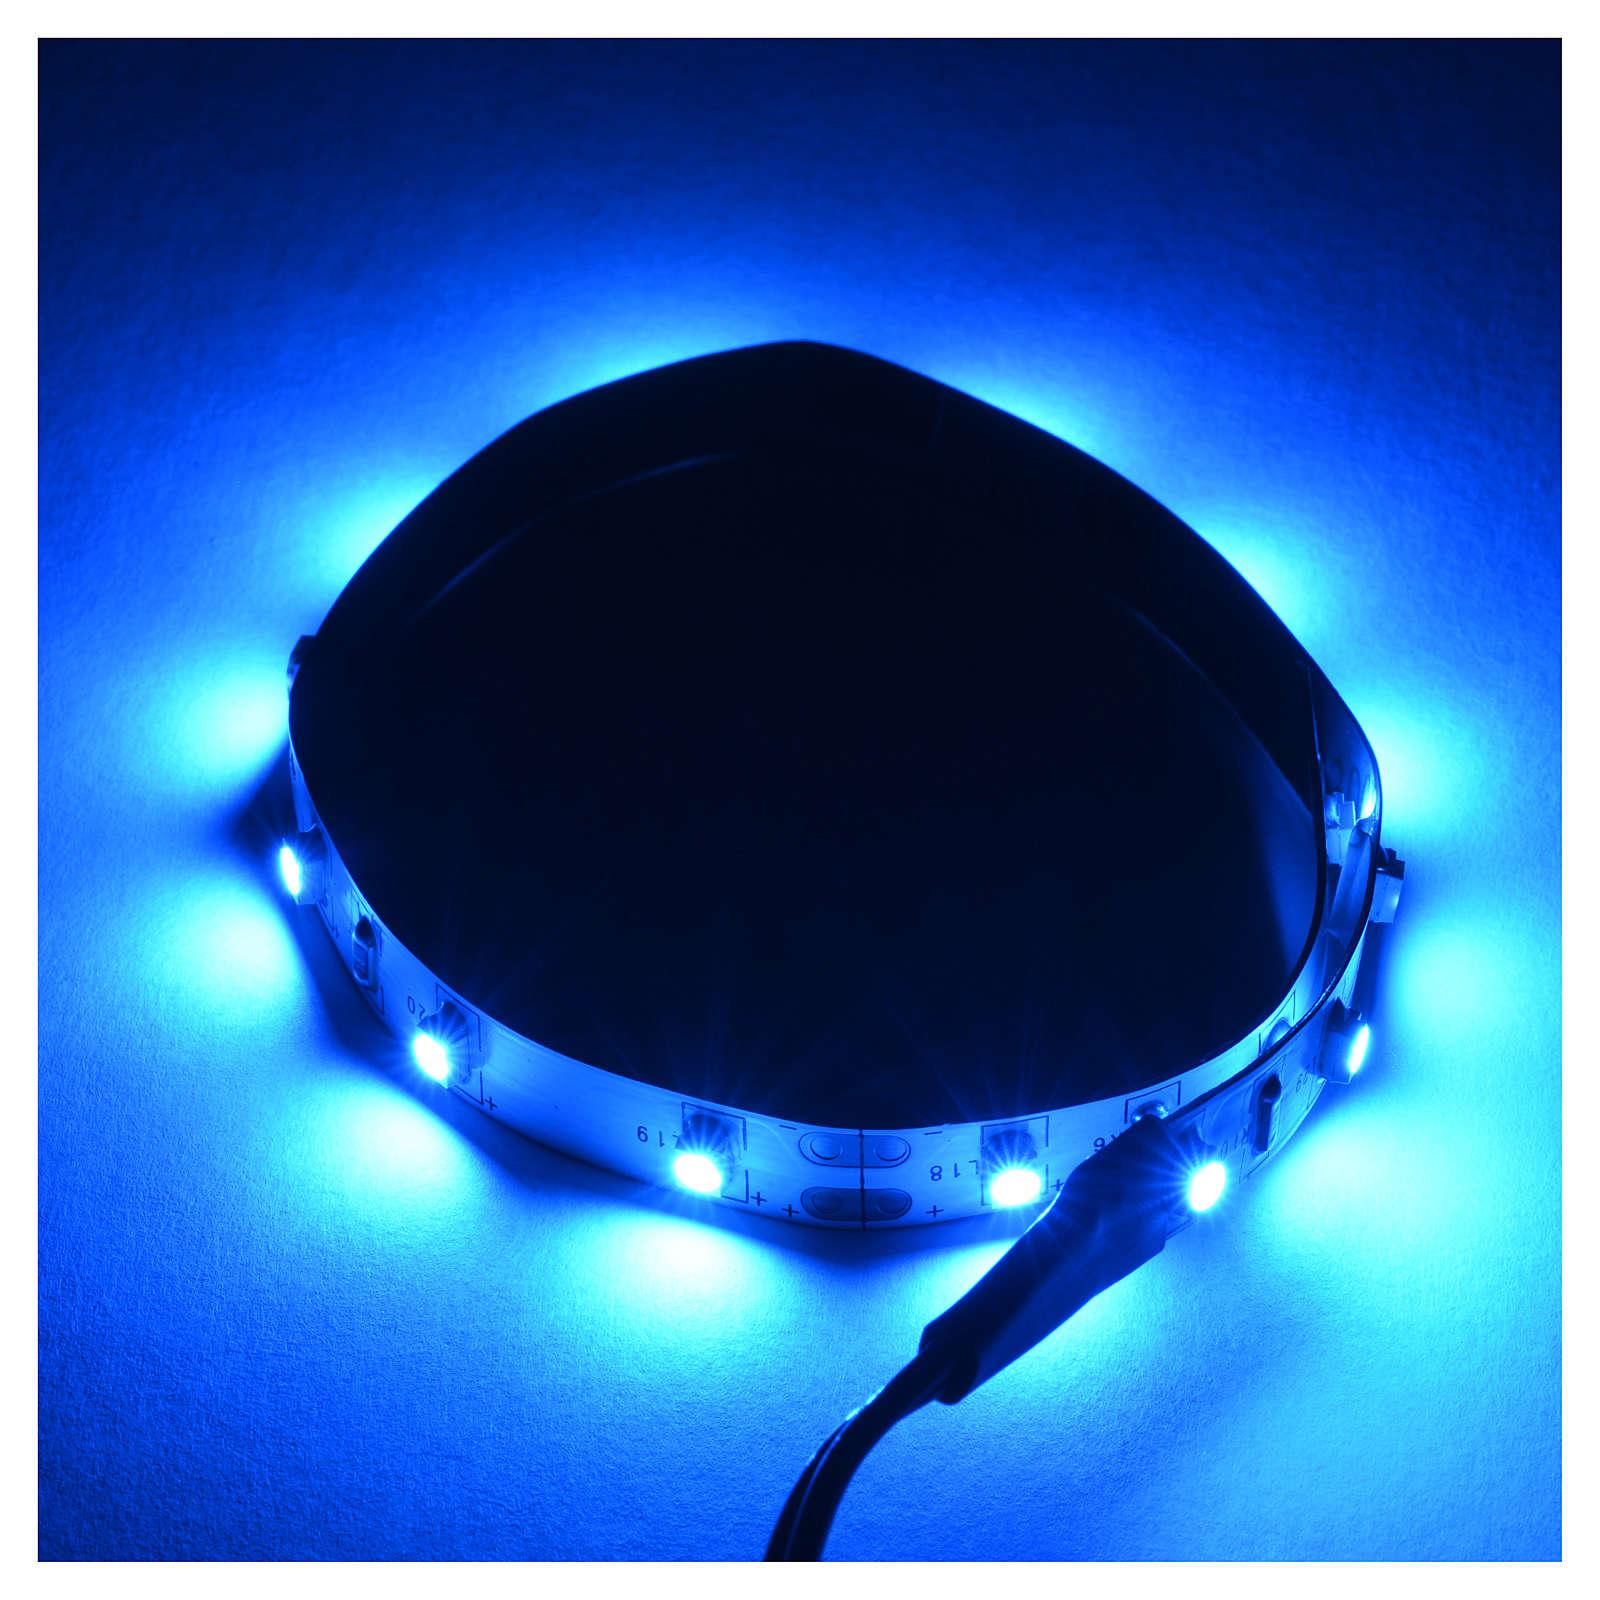 Pasek led Power 'PS' 15 led 0,8x25 cm niebieski FrialPower 4